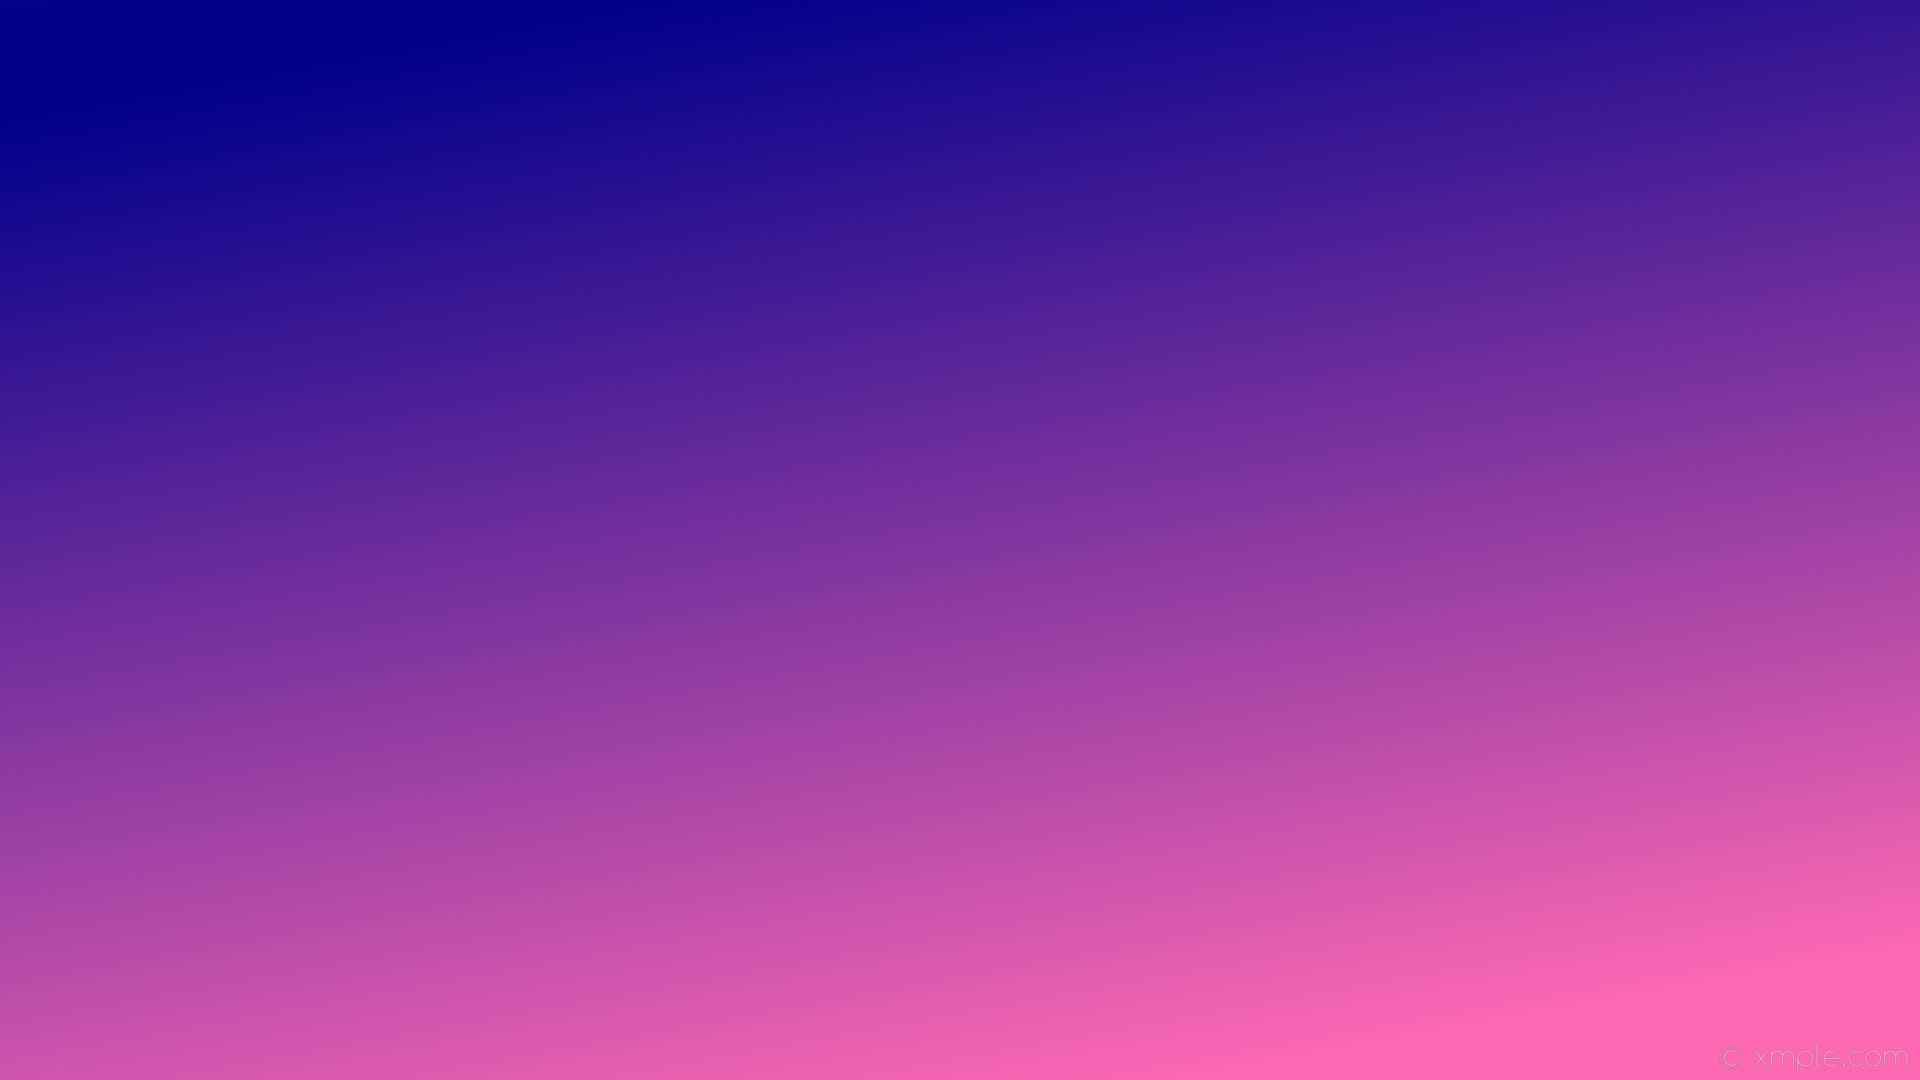 wallpaper blue pink gradient linear hot pink dark blue #ff69b4 #00008b 300°